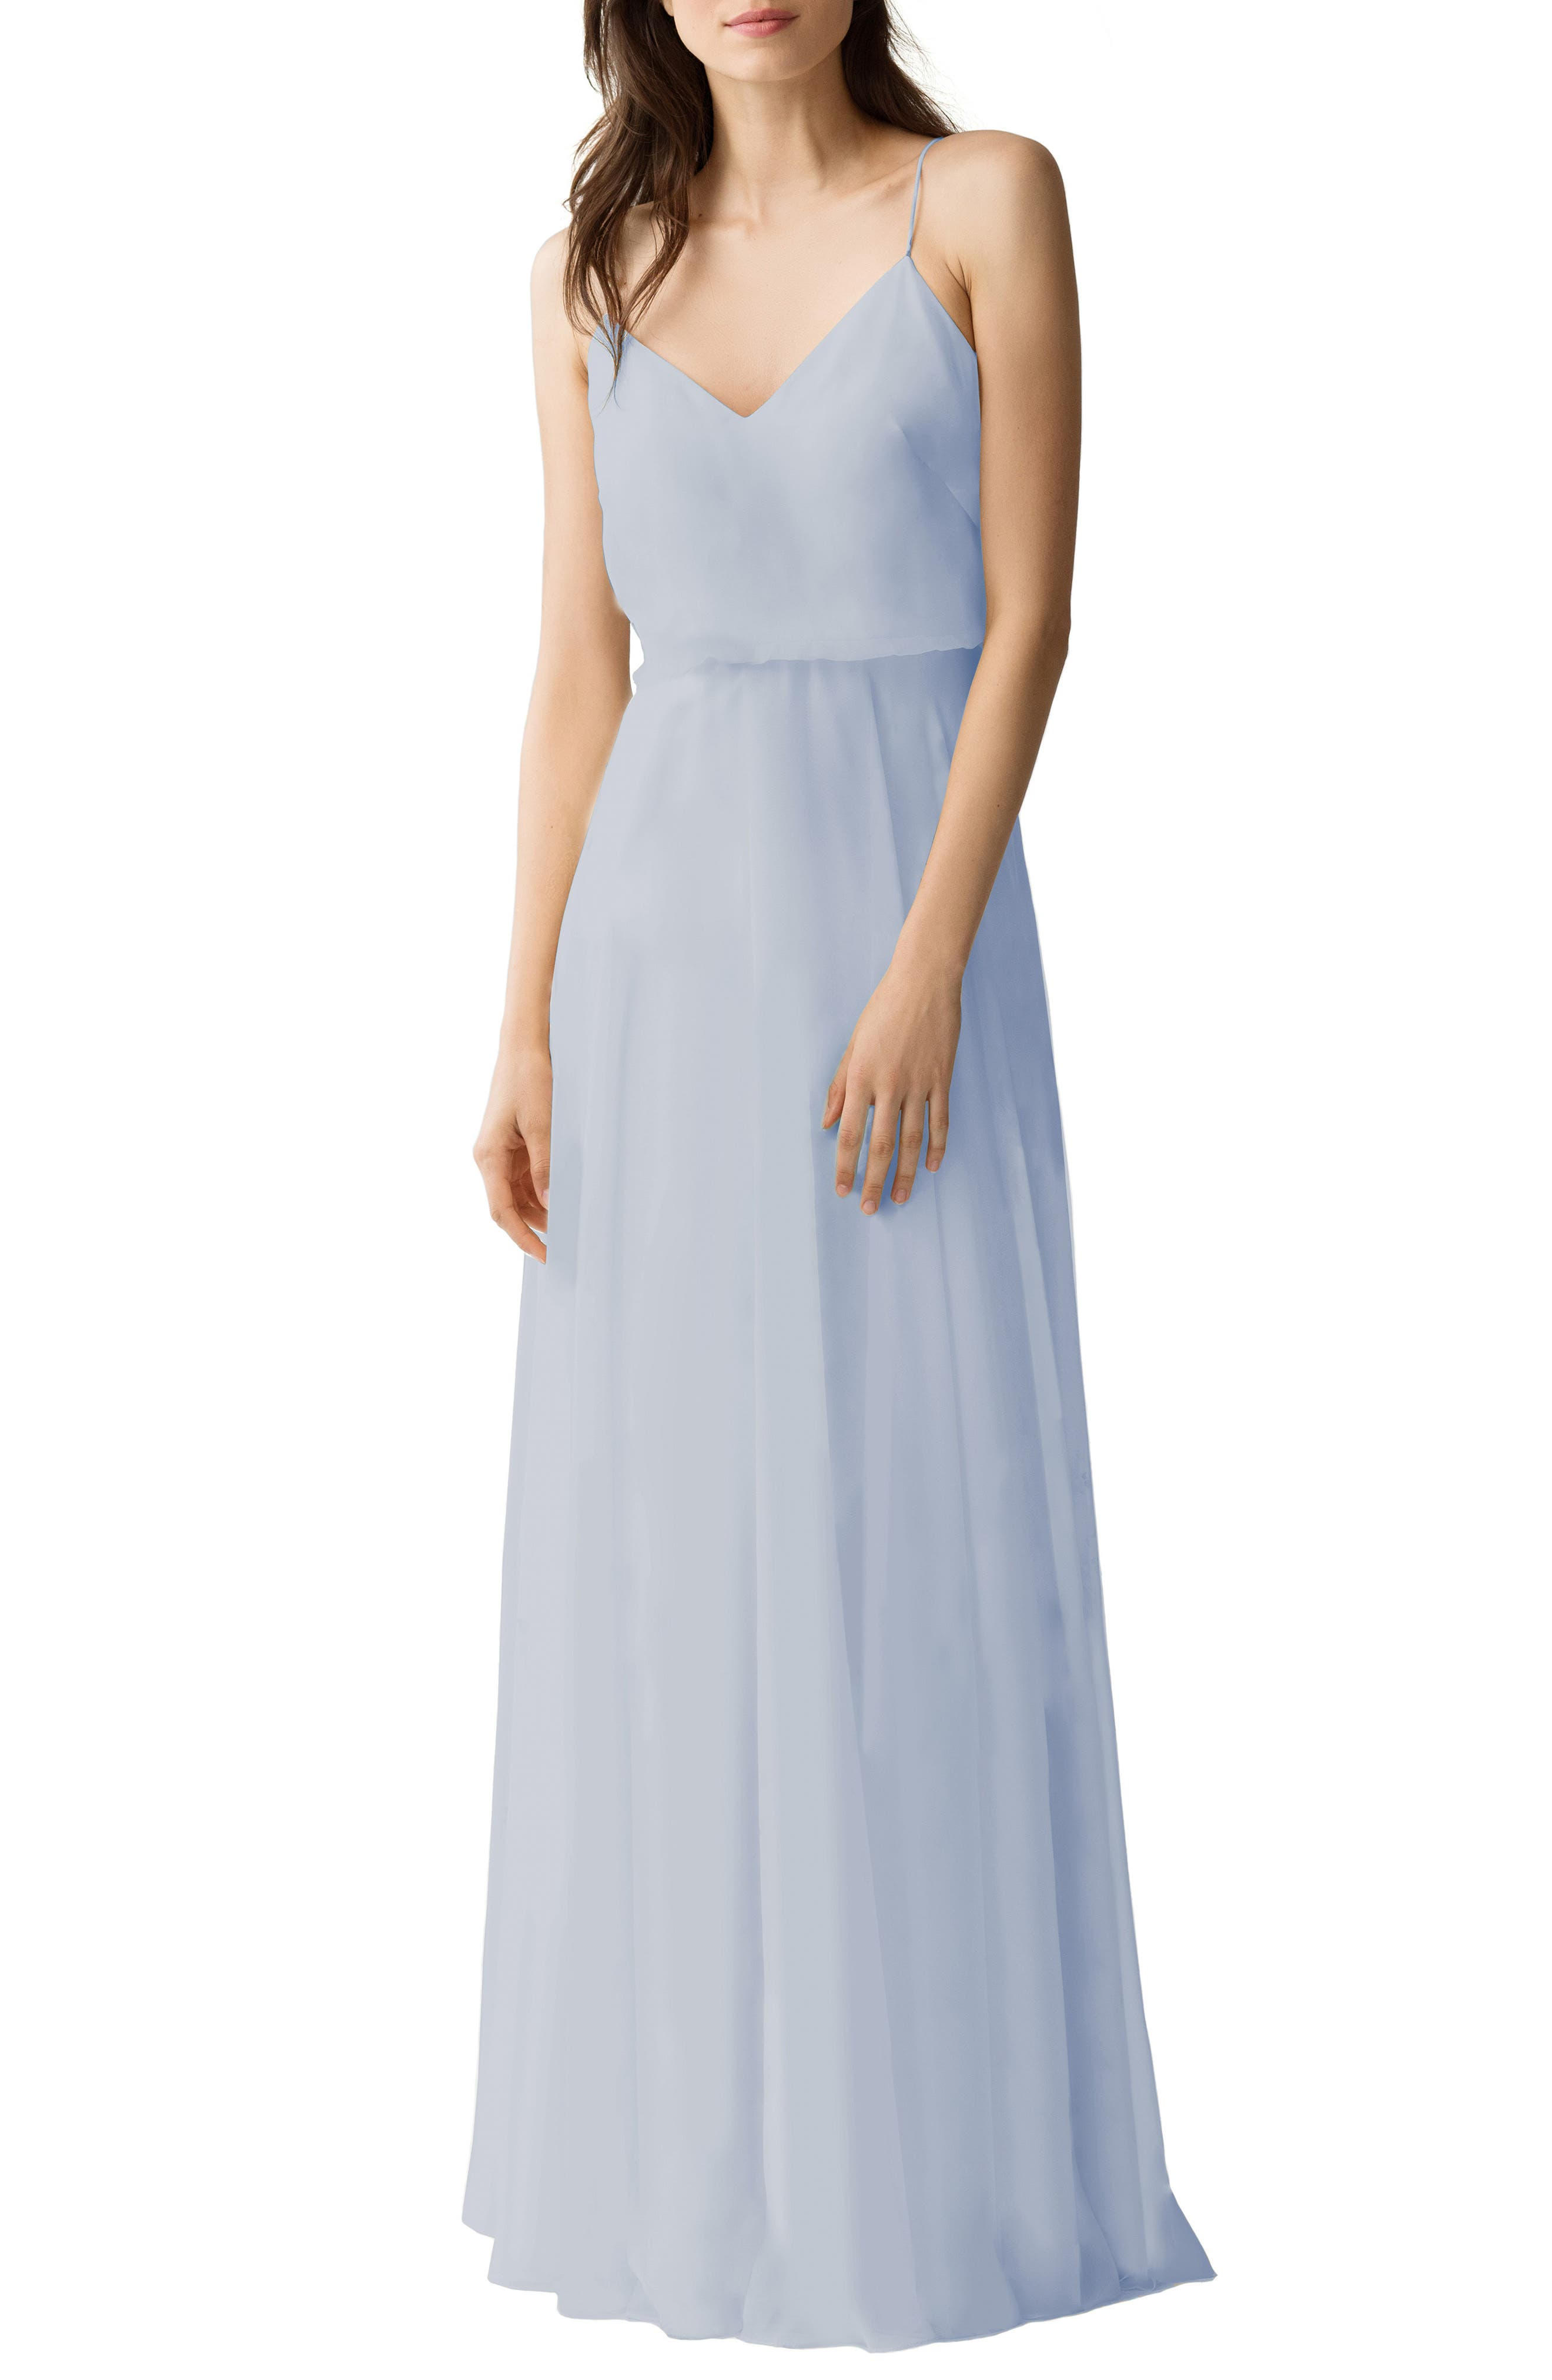 Jenny Yoo Inesse Chiffon V-Neck Spaghetti Strap Gown